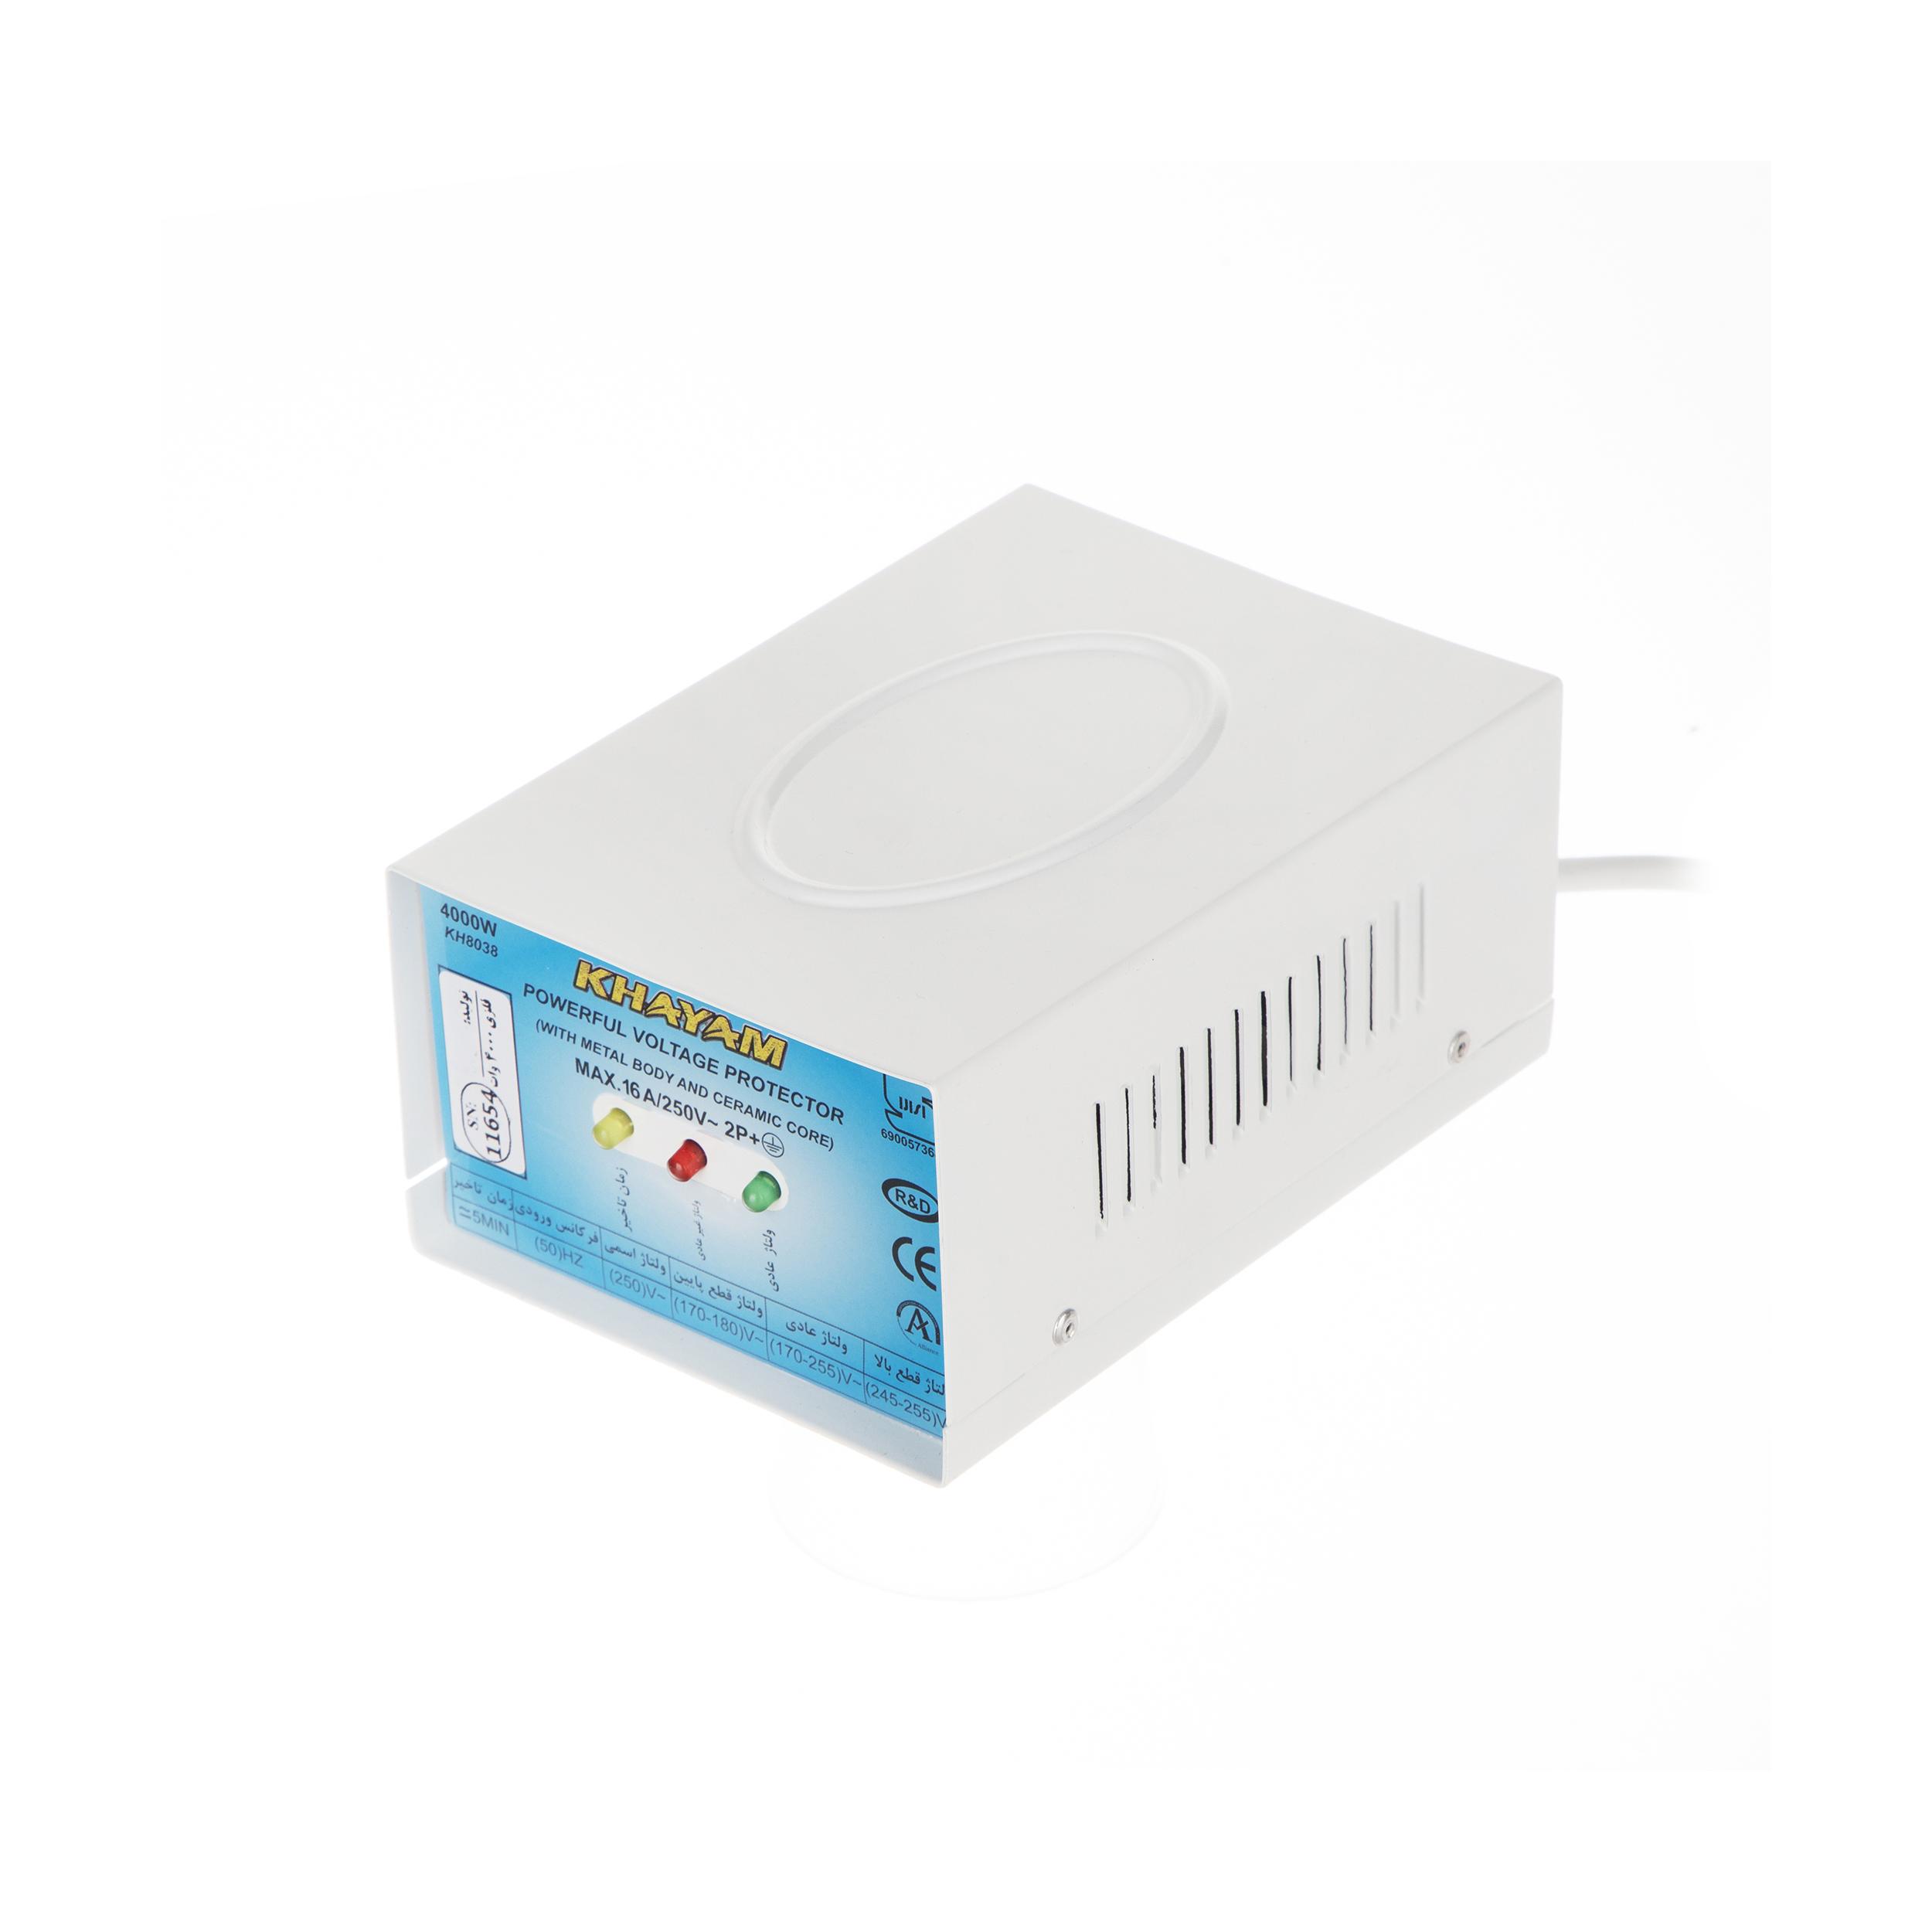 محافظ ولتاژ خیام الکتریک مدل KH8038